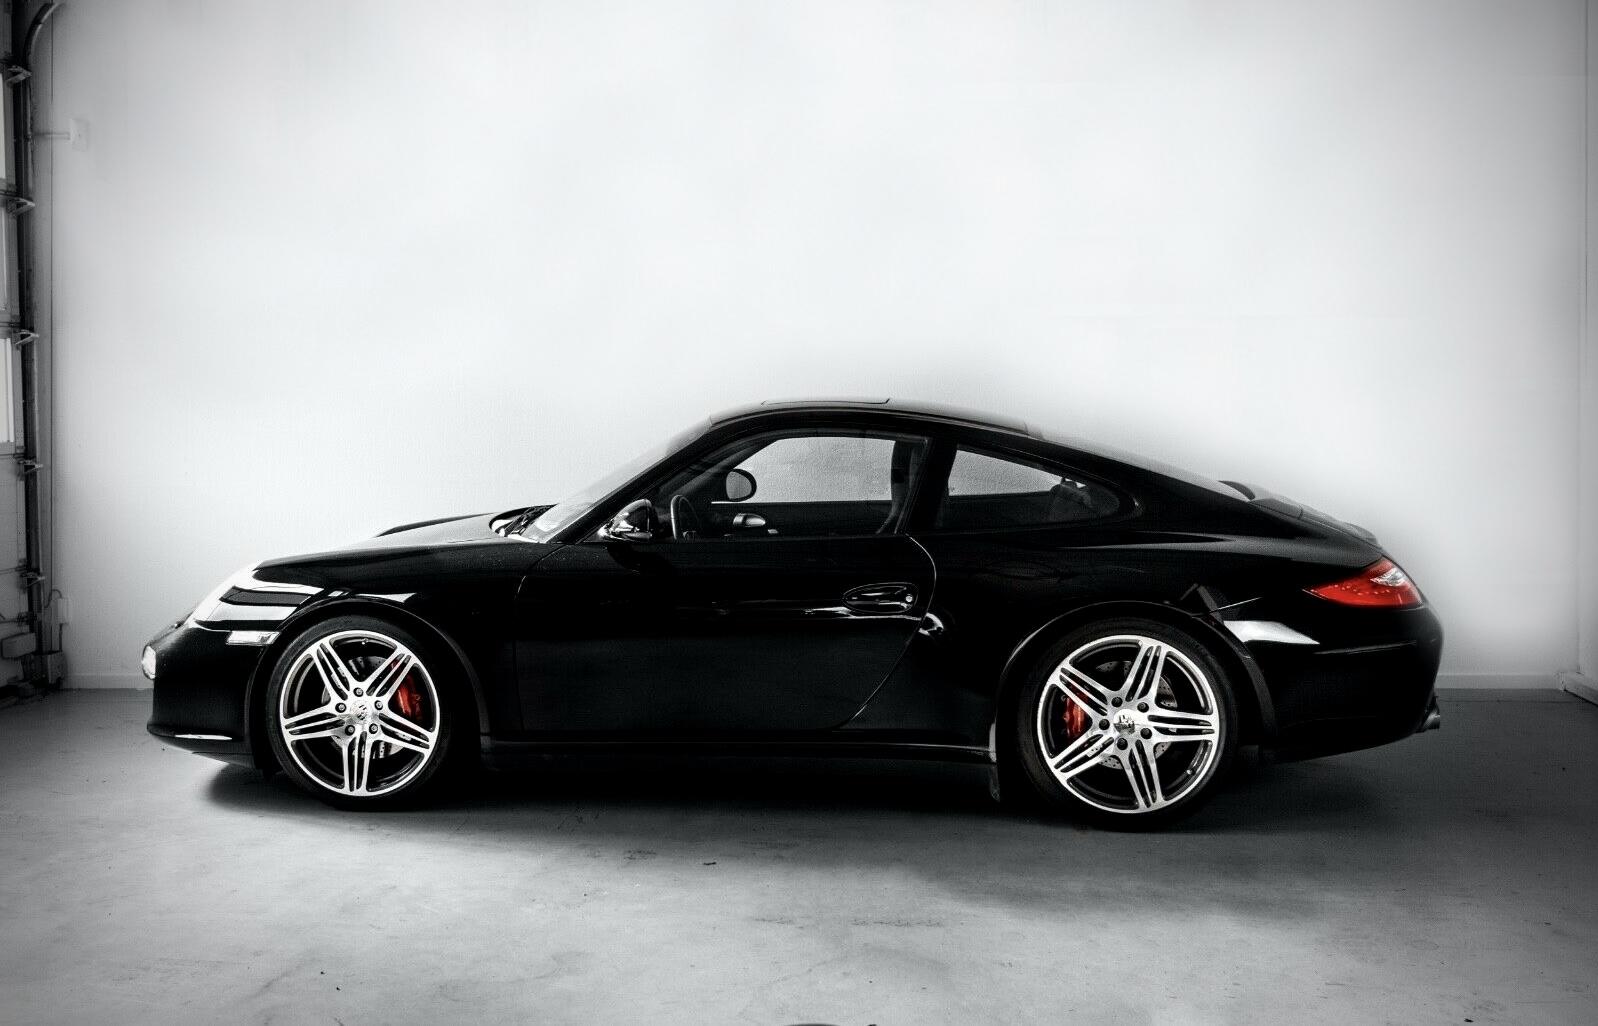 Porsche 997.2 Carrera 4S